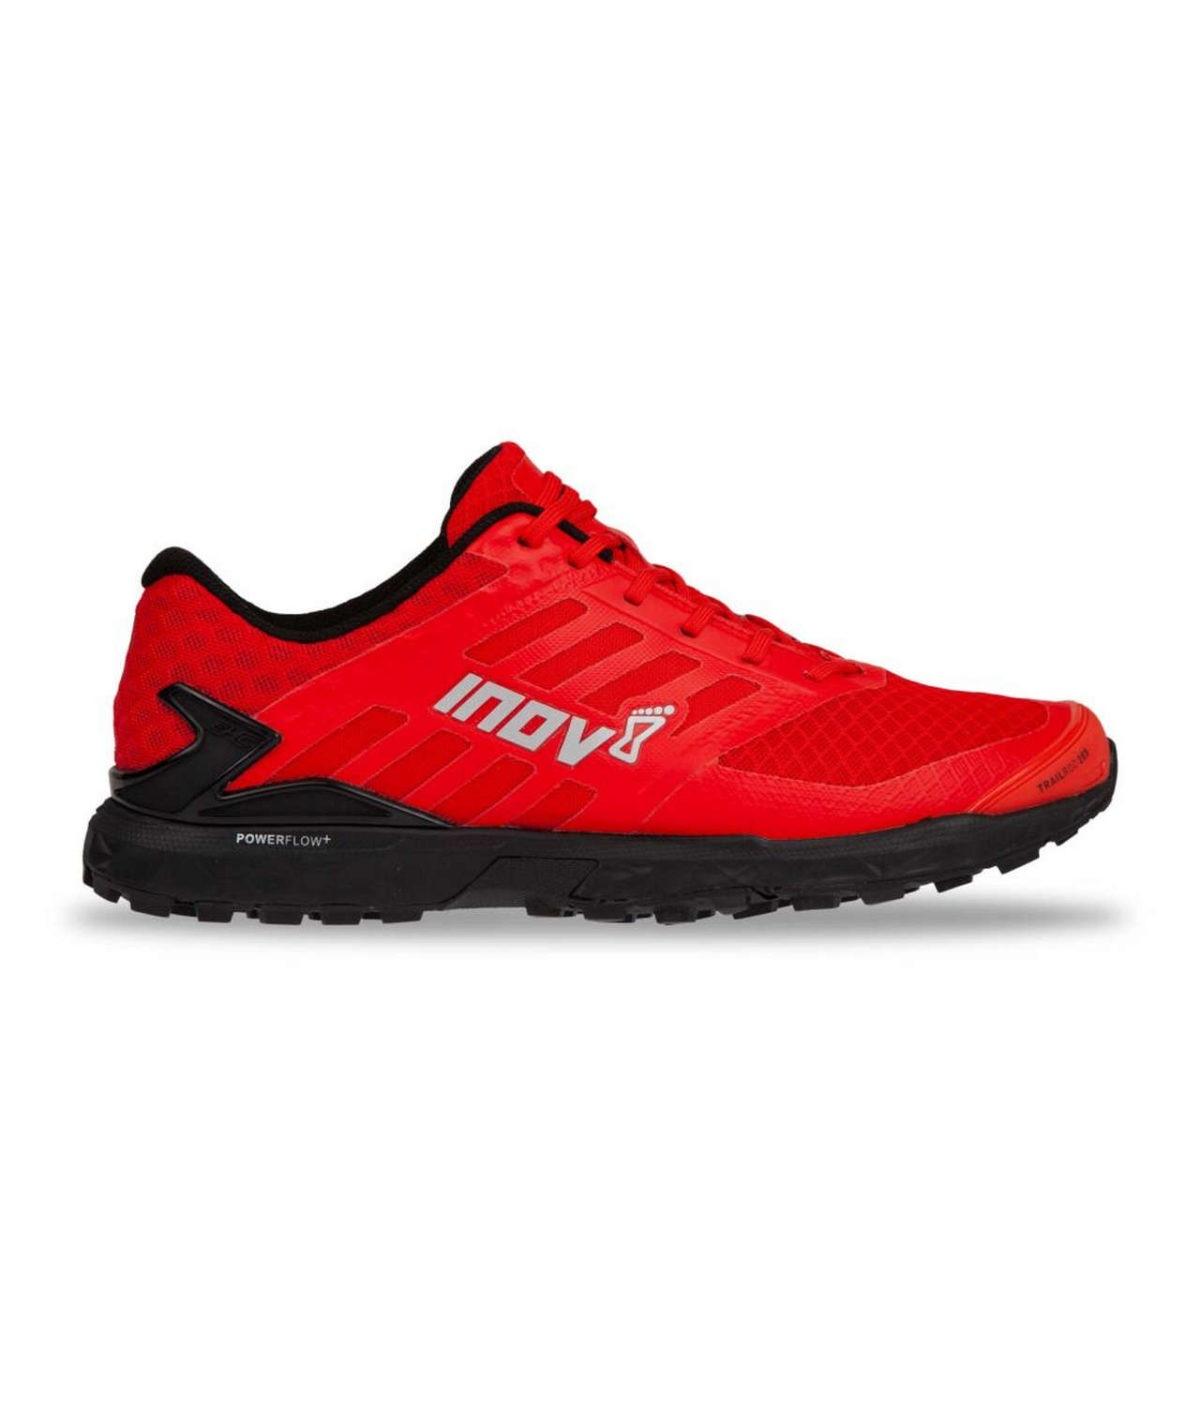 inov 8 Trailroc 285 trail shoe red black FastandLight 1 1